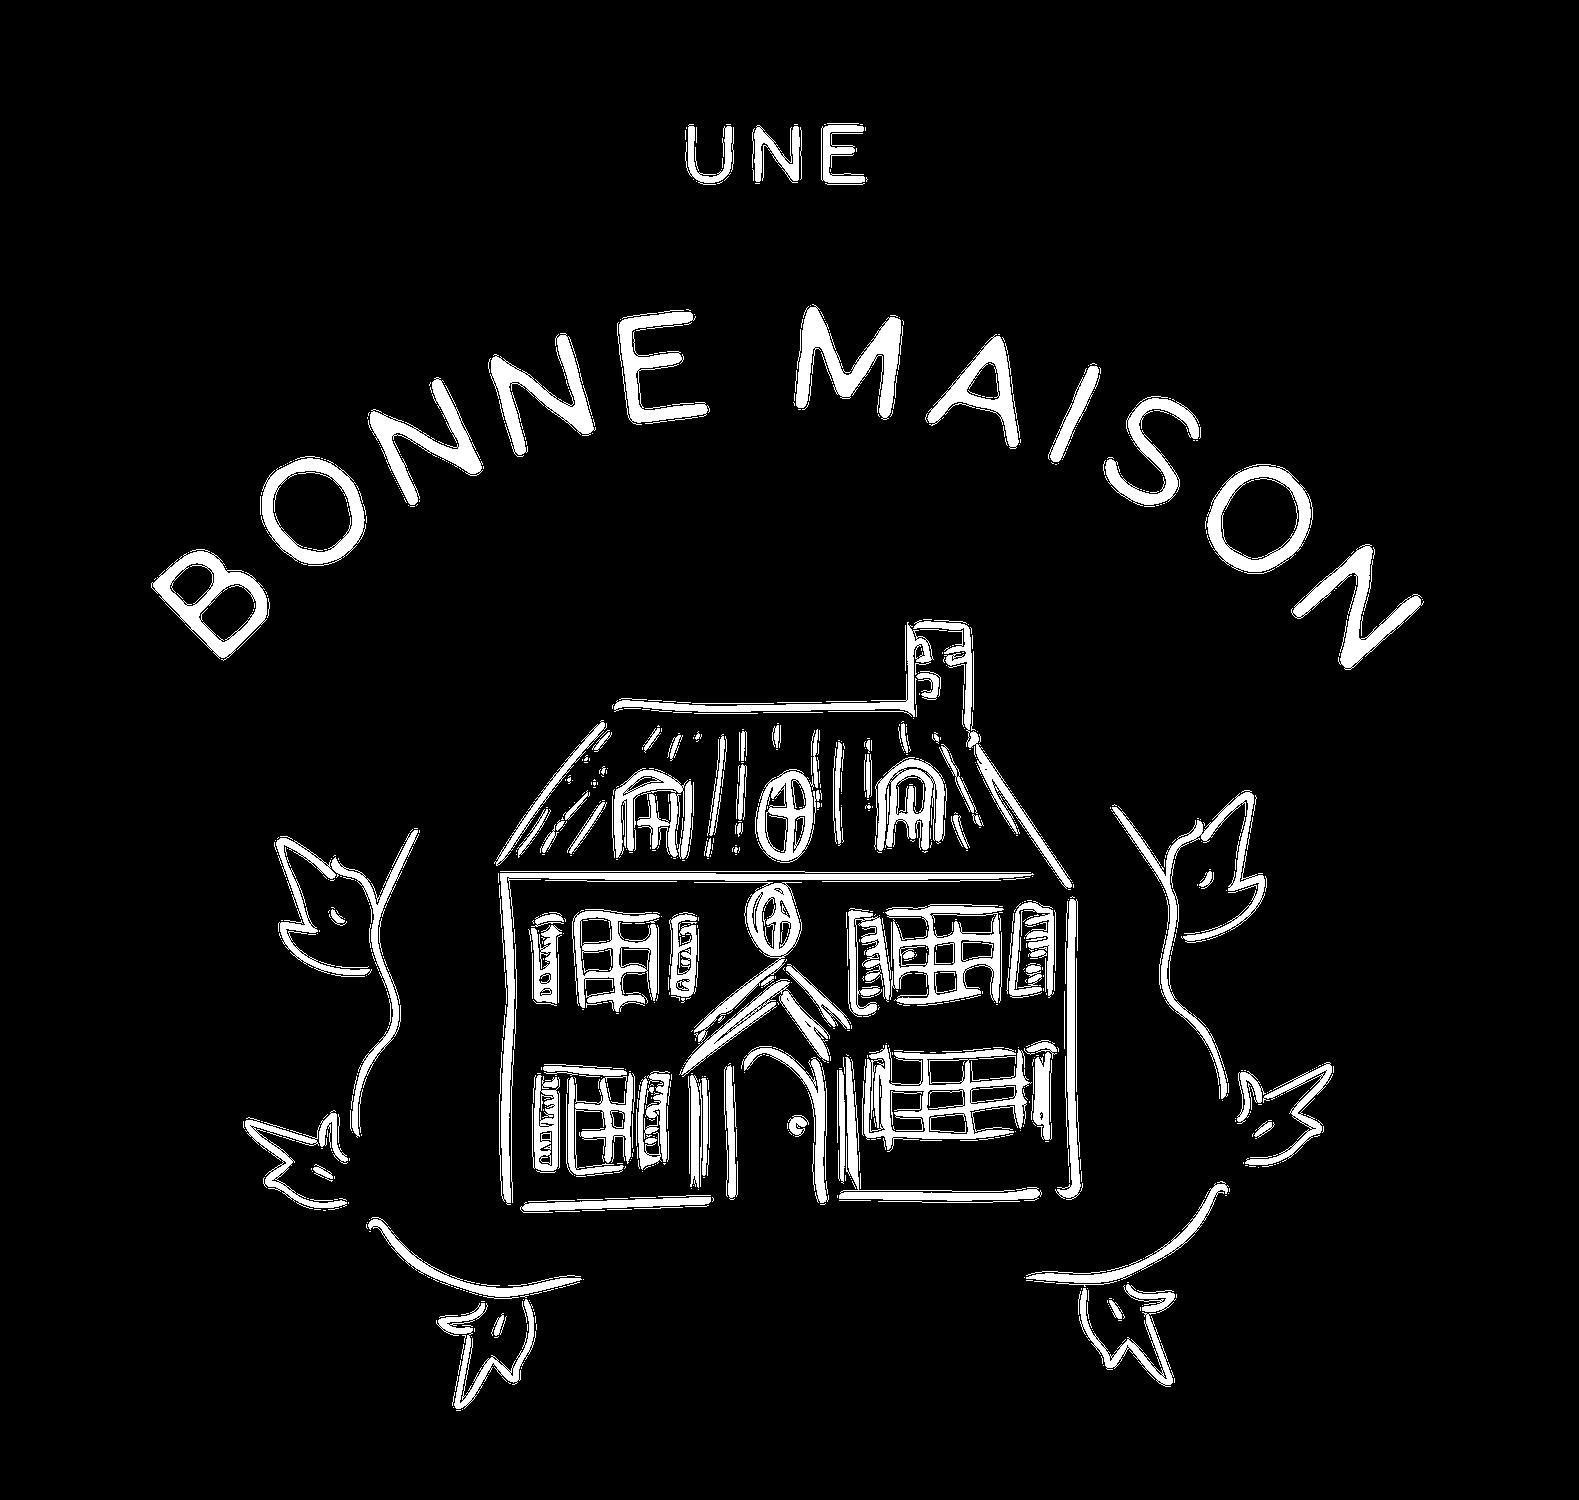 logo-une-bonne-maison-white-2x